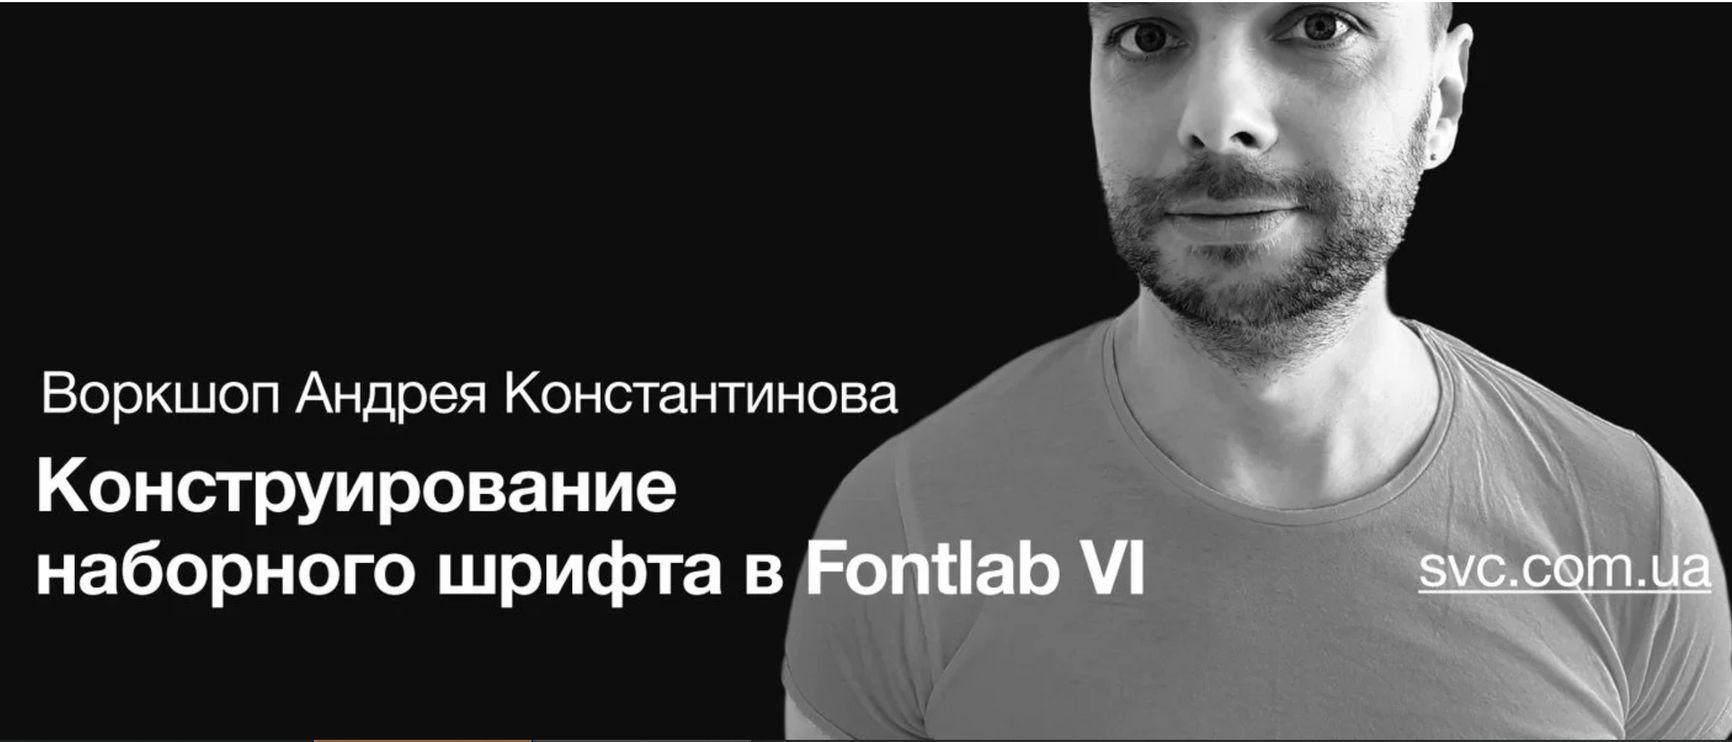 Дизайнер-шрифтовик Андрей Константинов